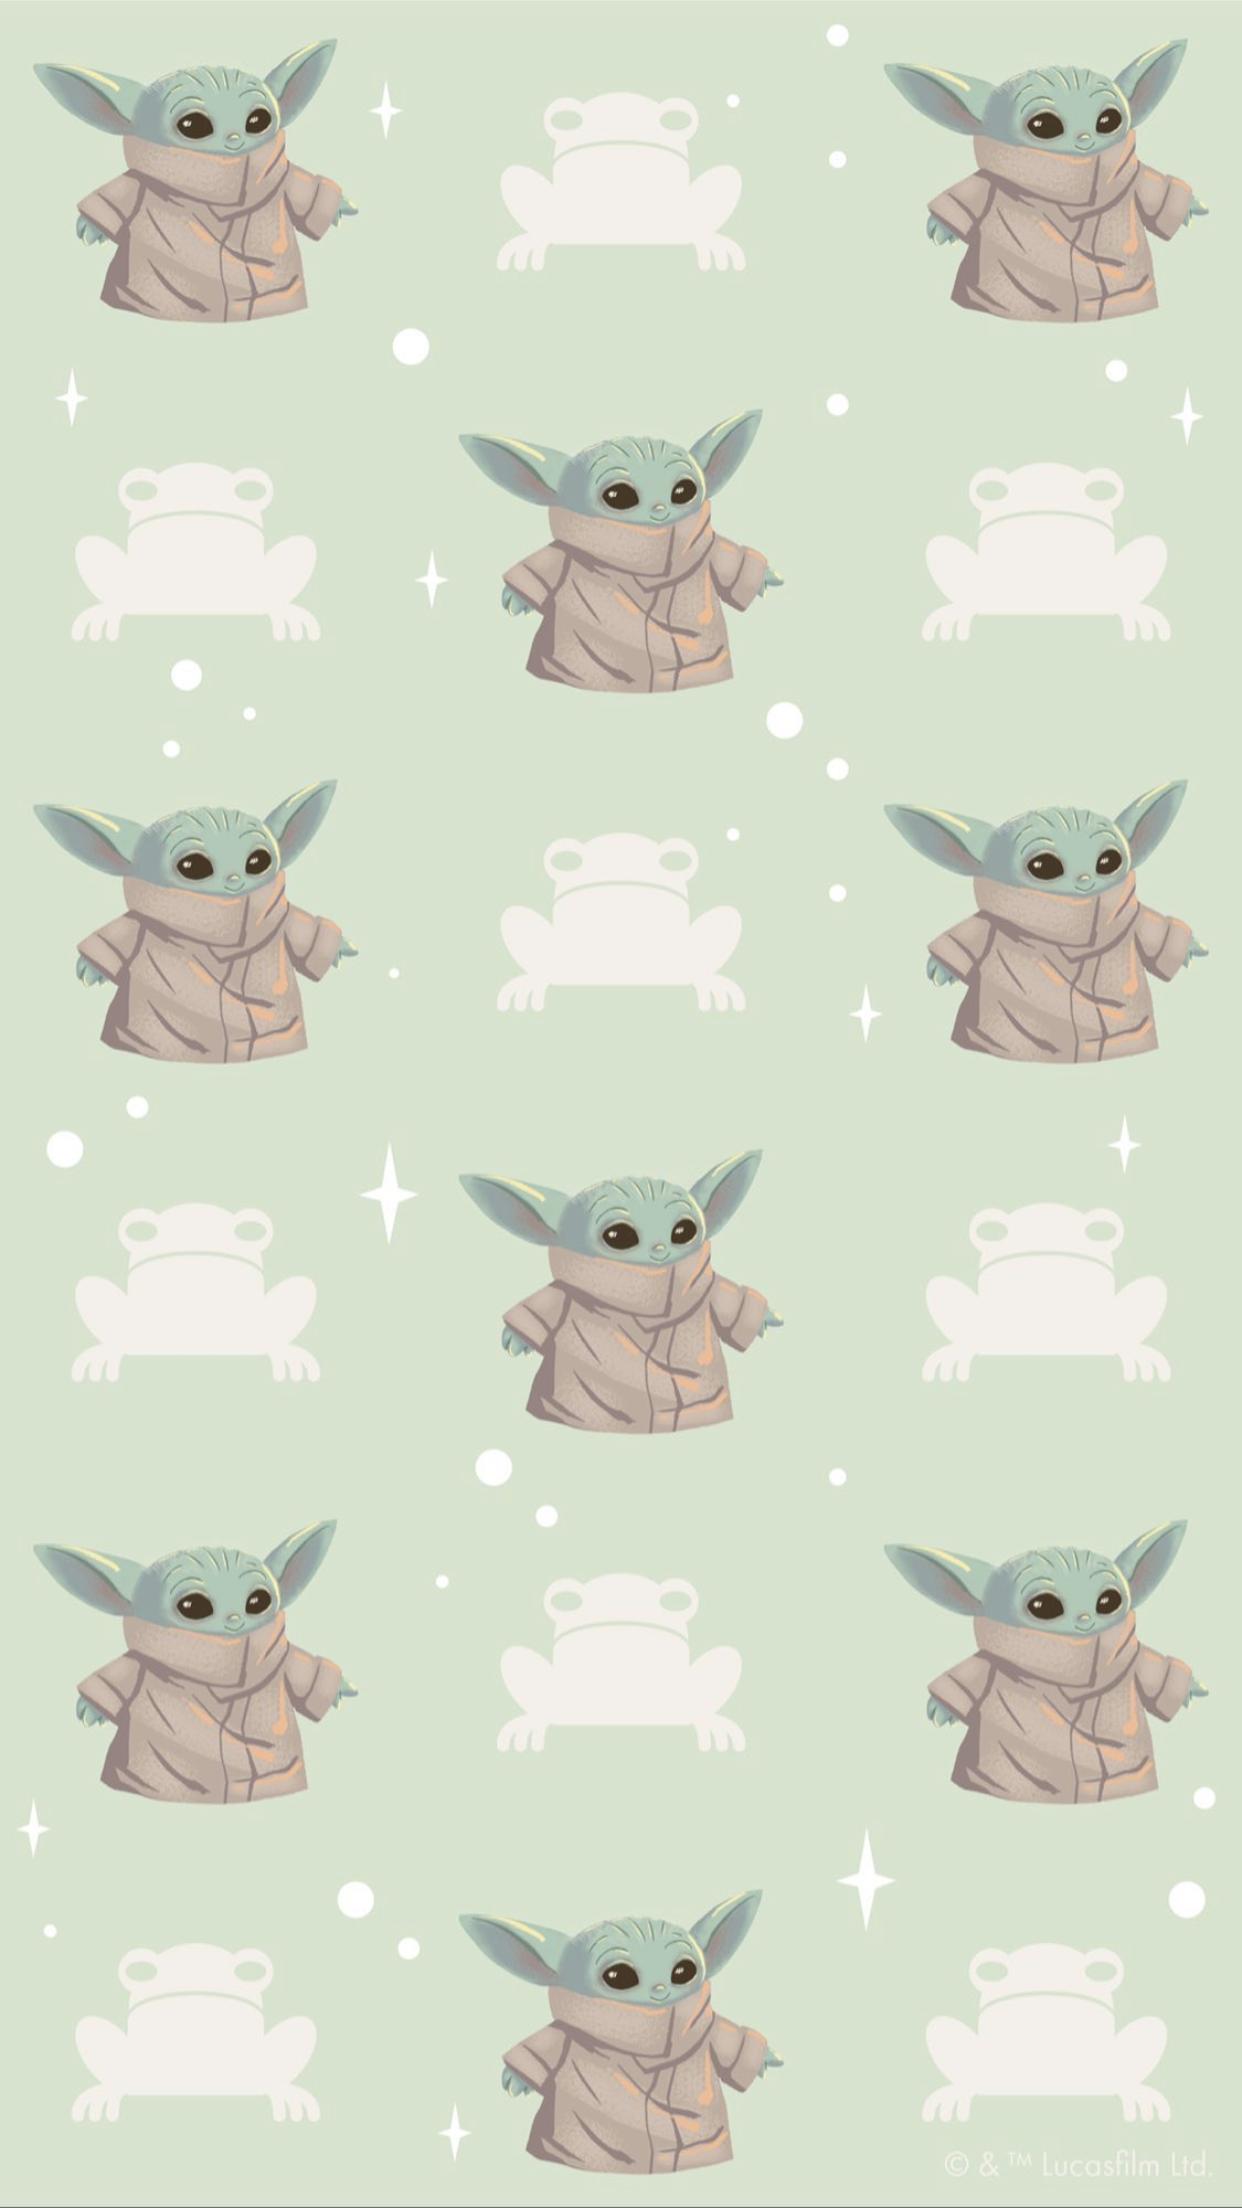 Pin By Nikki Jones On Mandalorian Yoda Wallpaper Cute Cartoon Wallpapers Star Wars Artwork